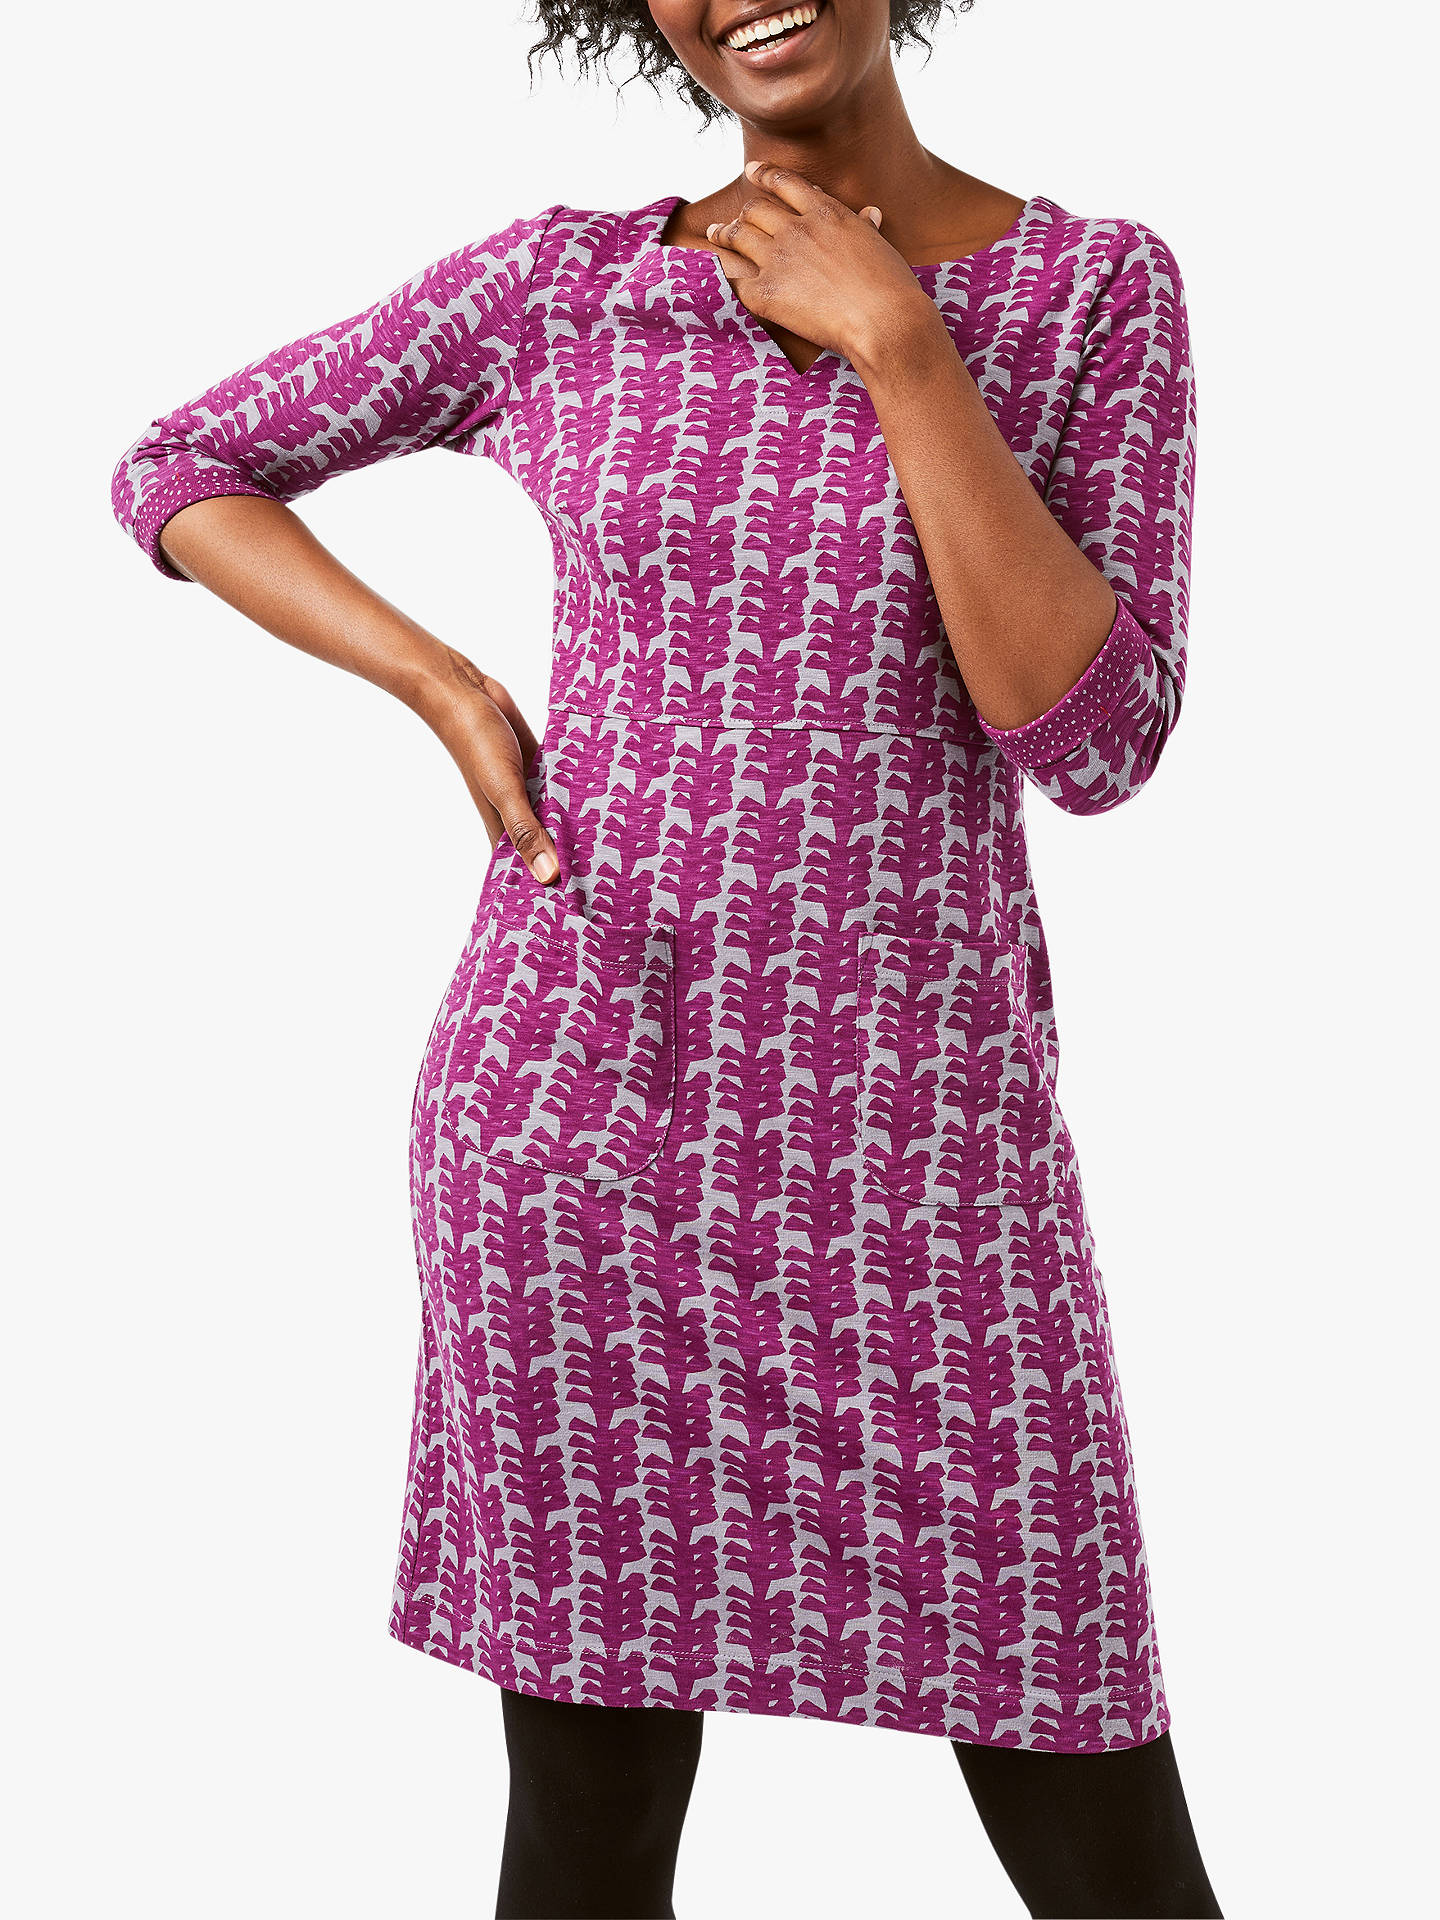 a3eb793228 White Stuff Polly Dress, Purple Print at John Lewis & Partners